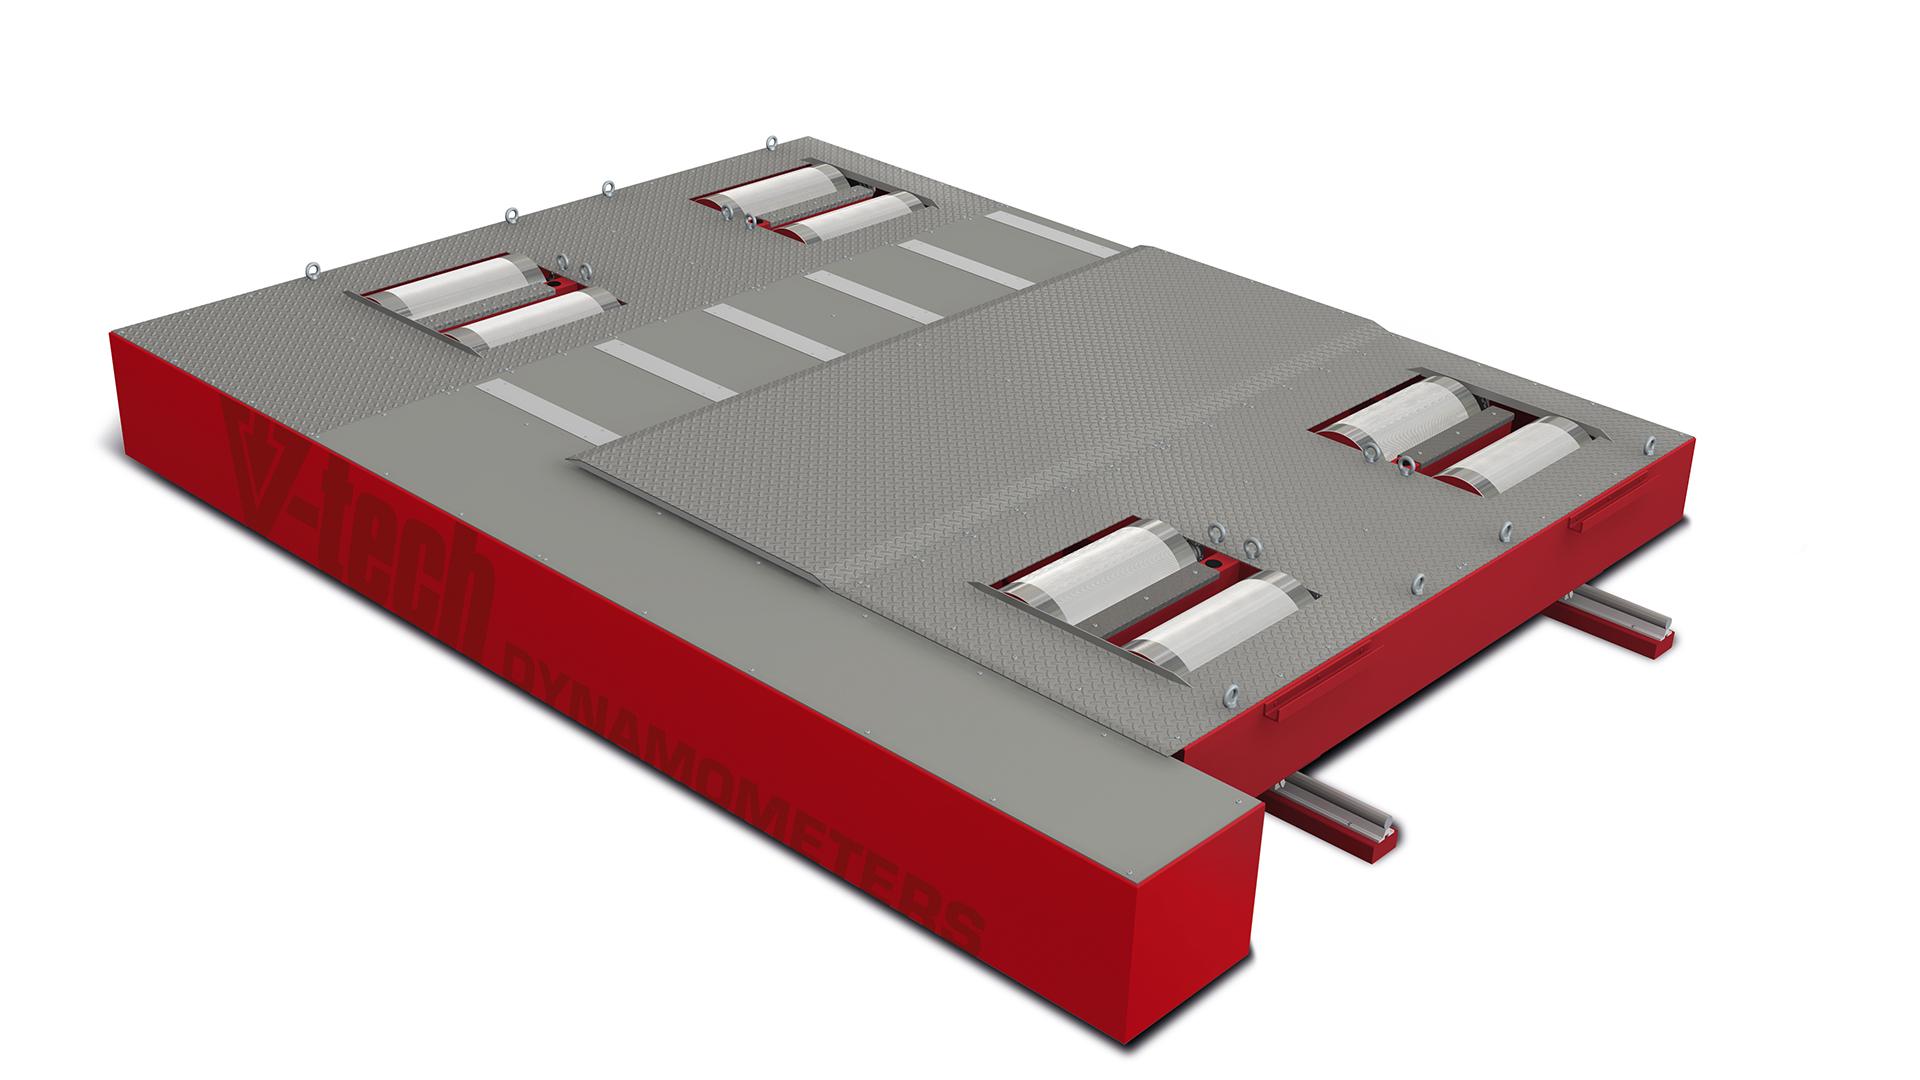 VT 4 Modular Dynamometer V tech Dynamometers